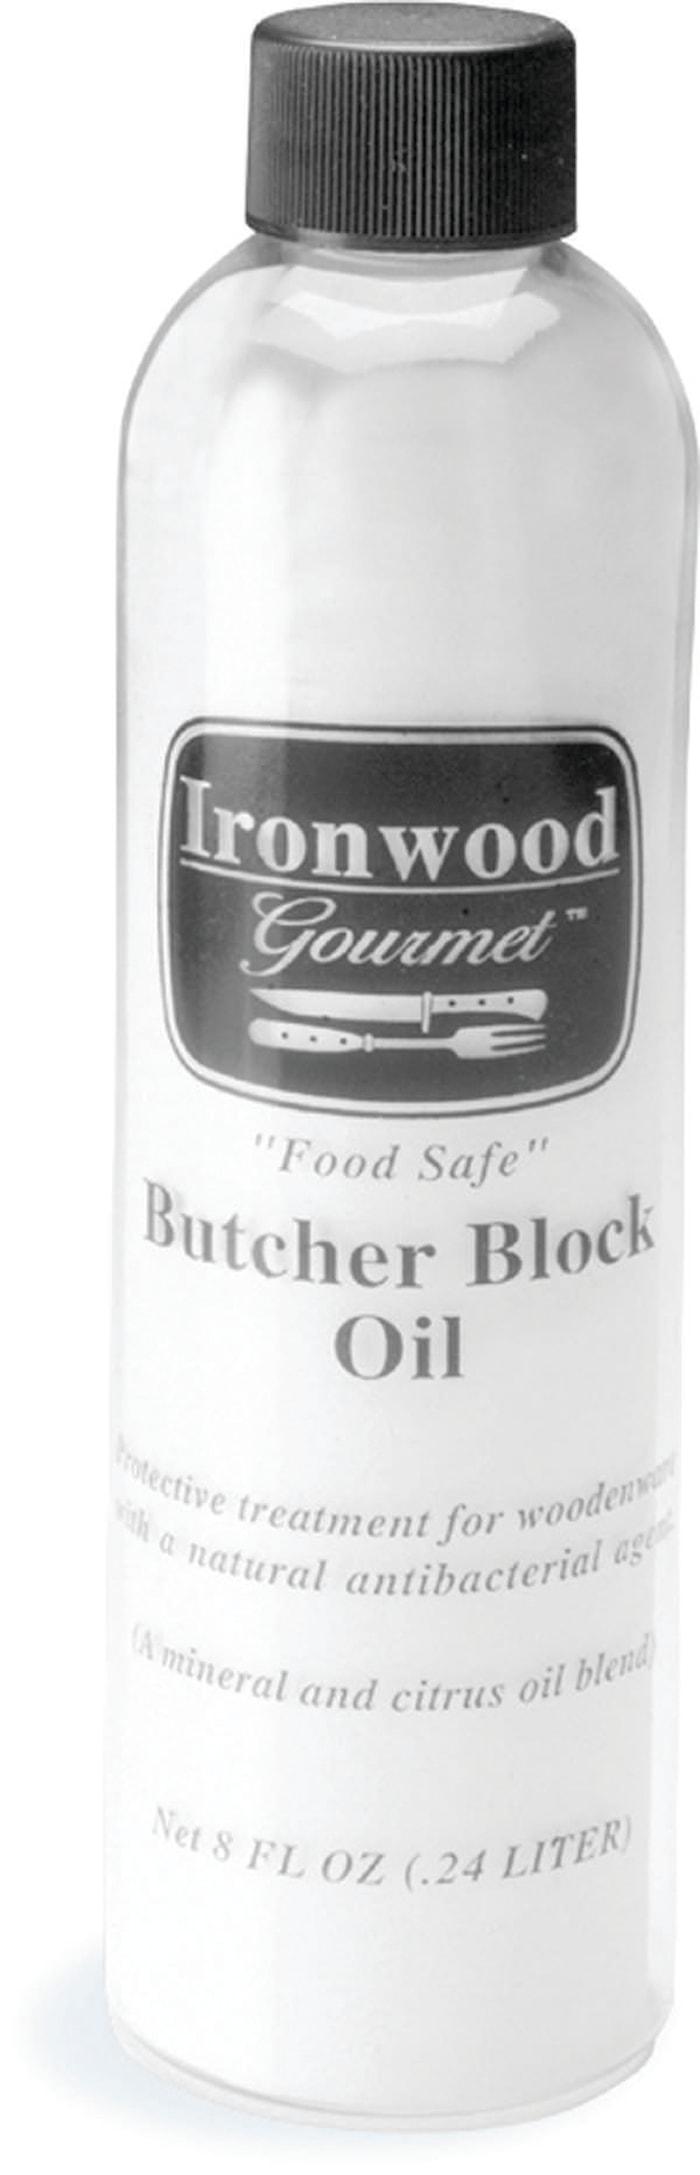 Nyhet: Ironwood Gourmet Butcher Block Oil, 12-pack